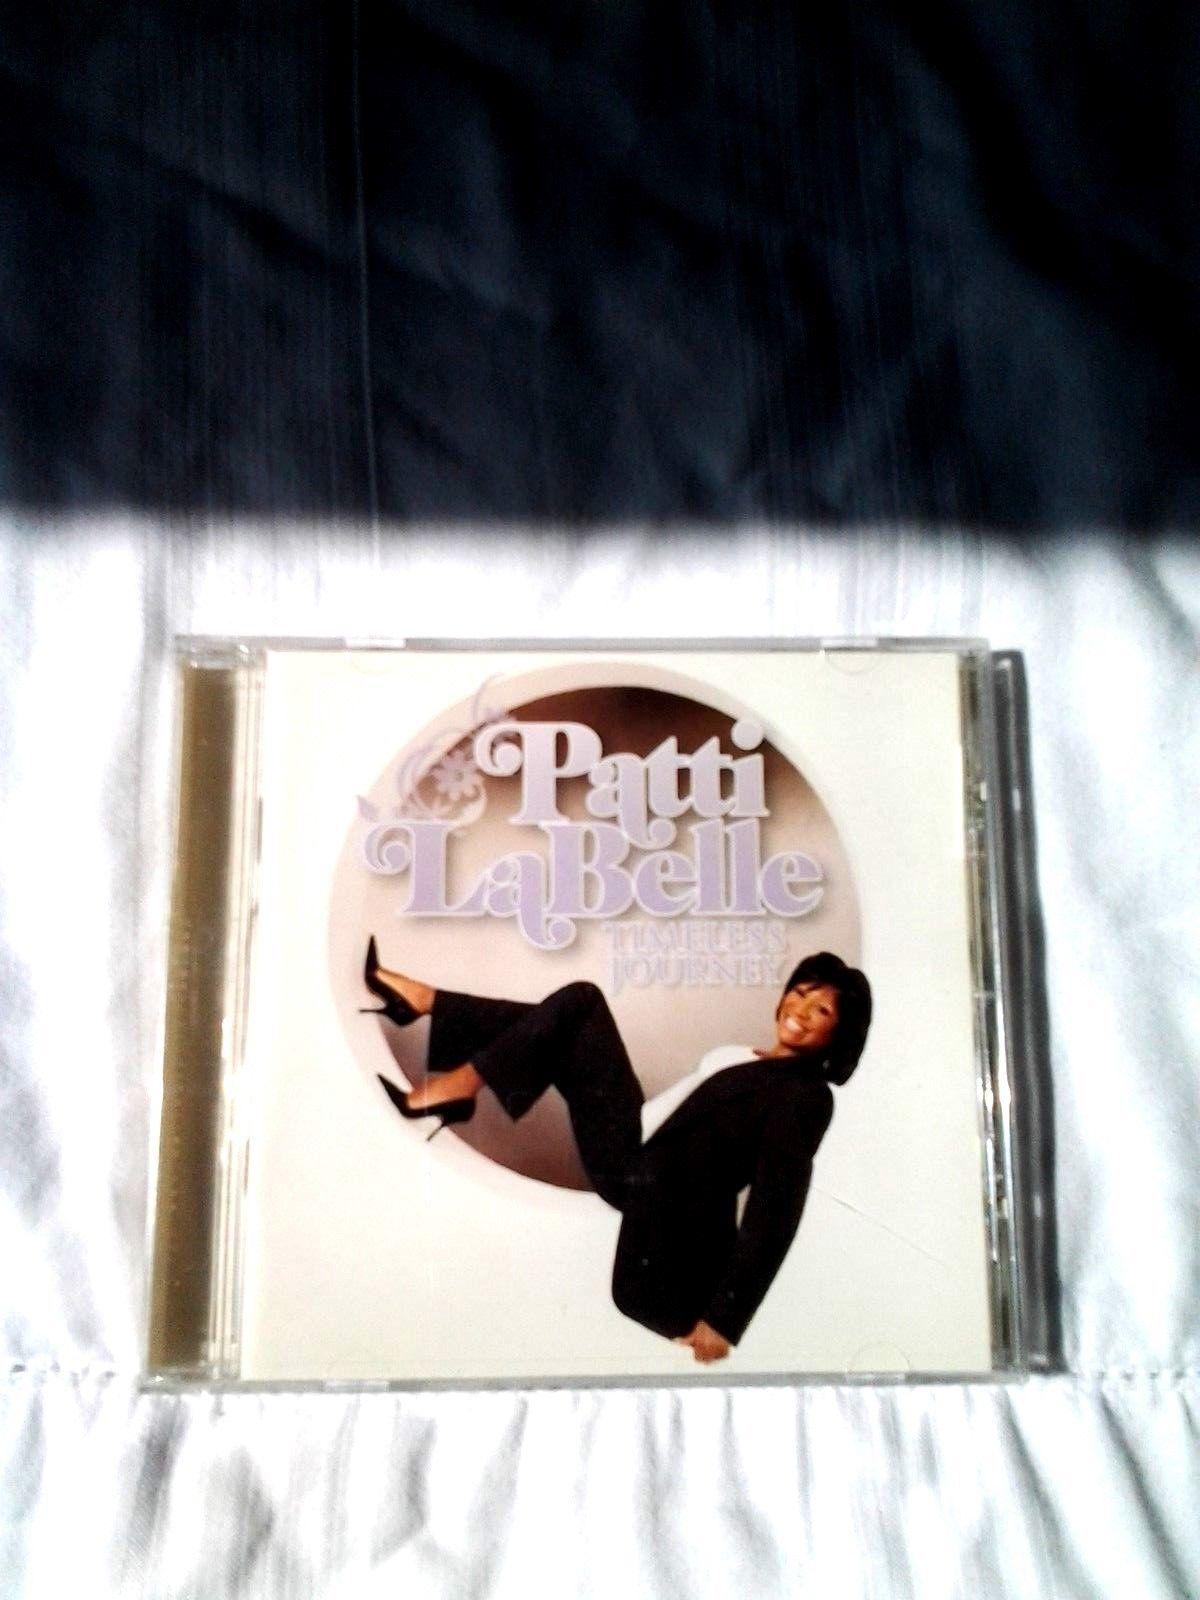 Patti LaBelle - Timeless Journey (CD, Album) 2004